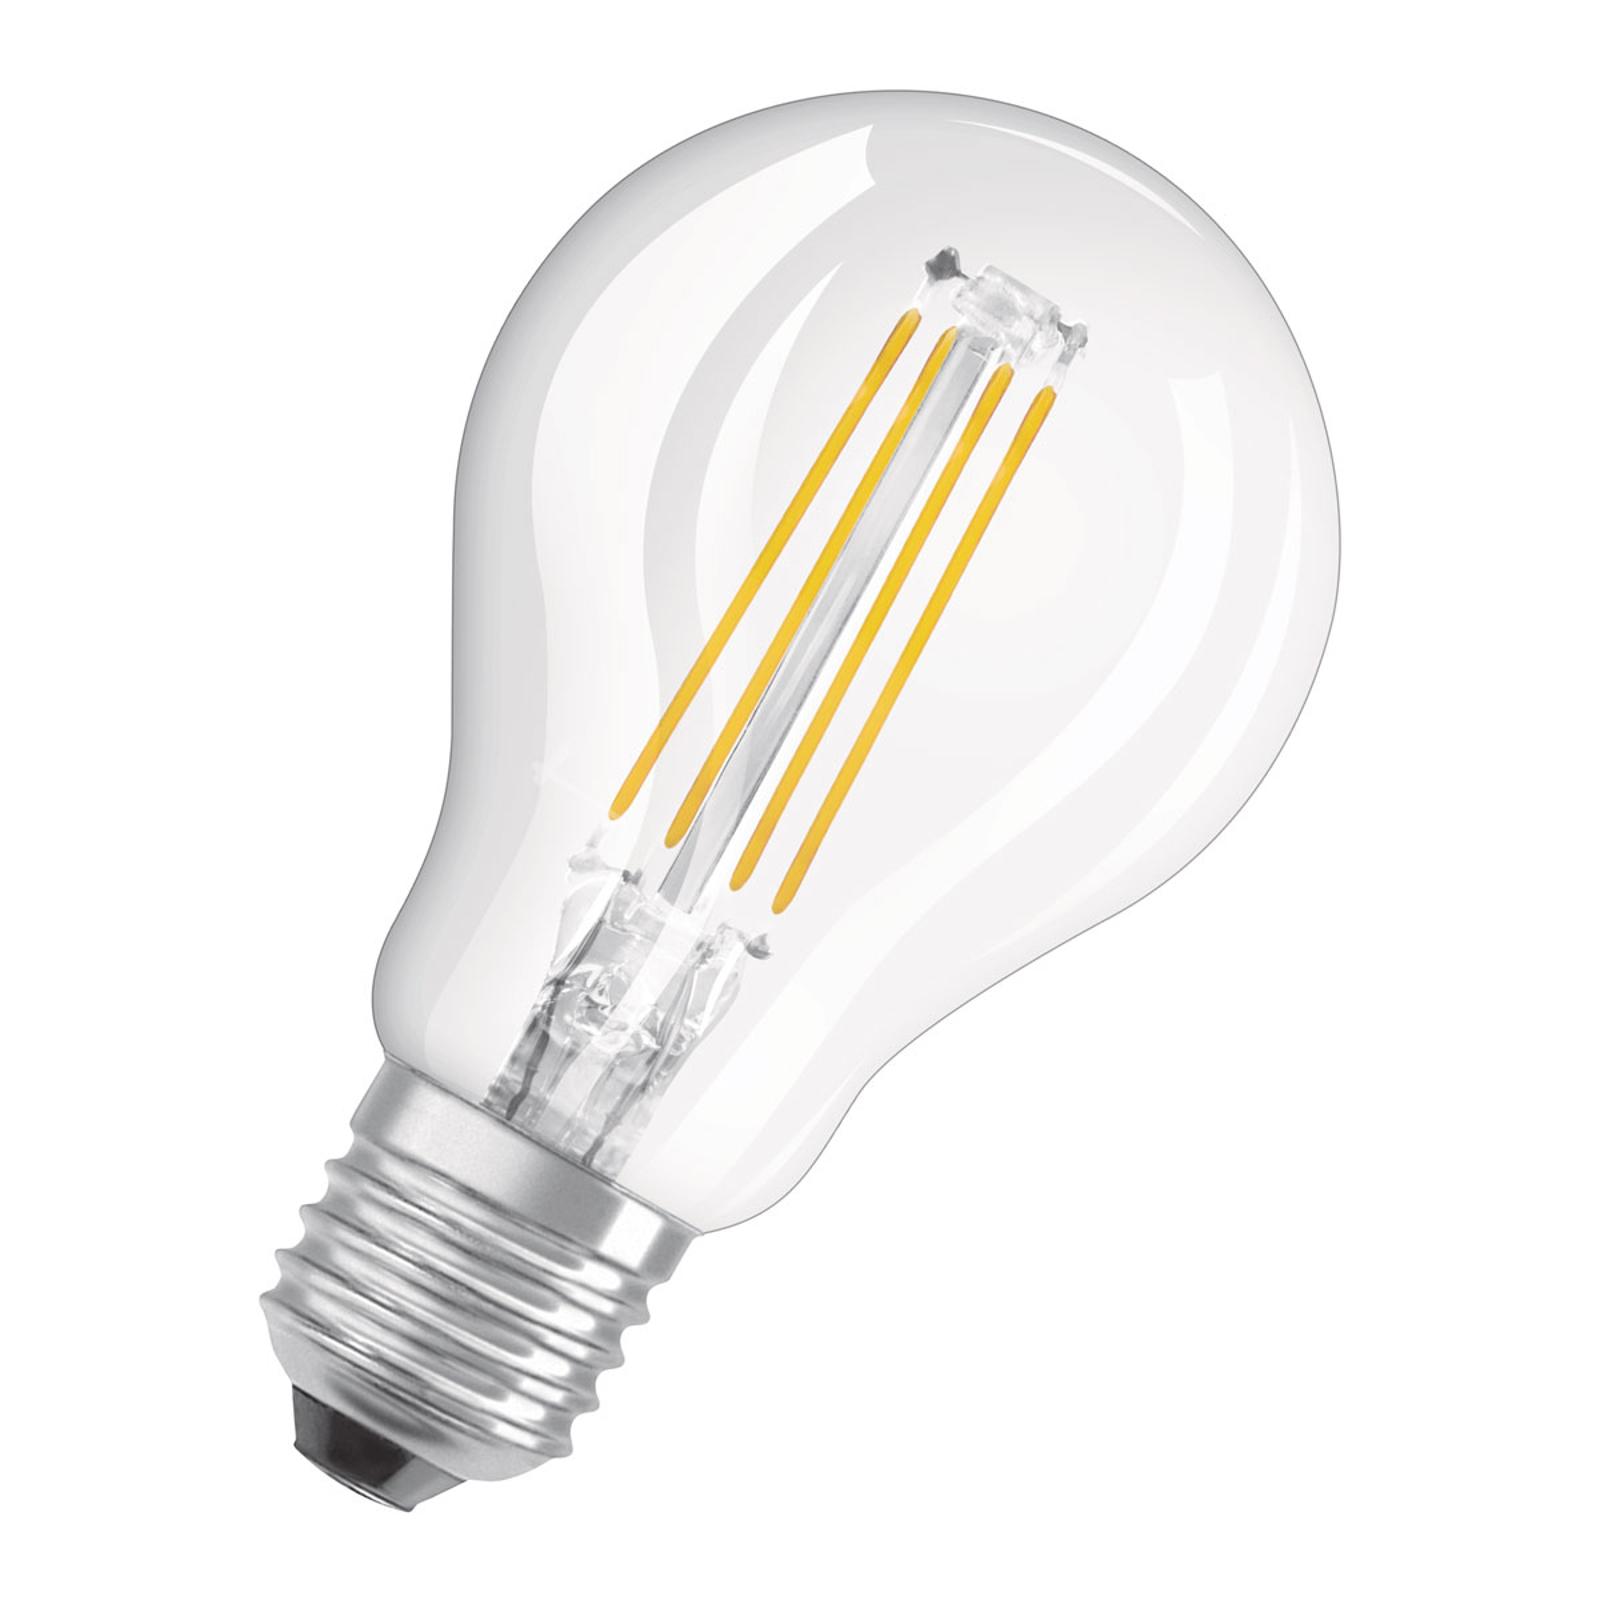 OSRAM LED-Tropfenlampe E27 Superstar 5W klar 4.000